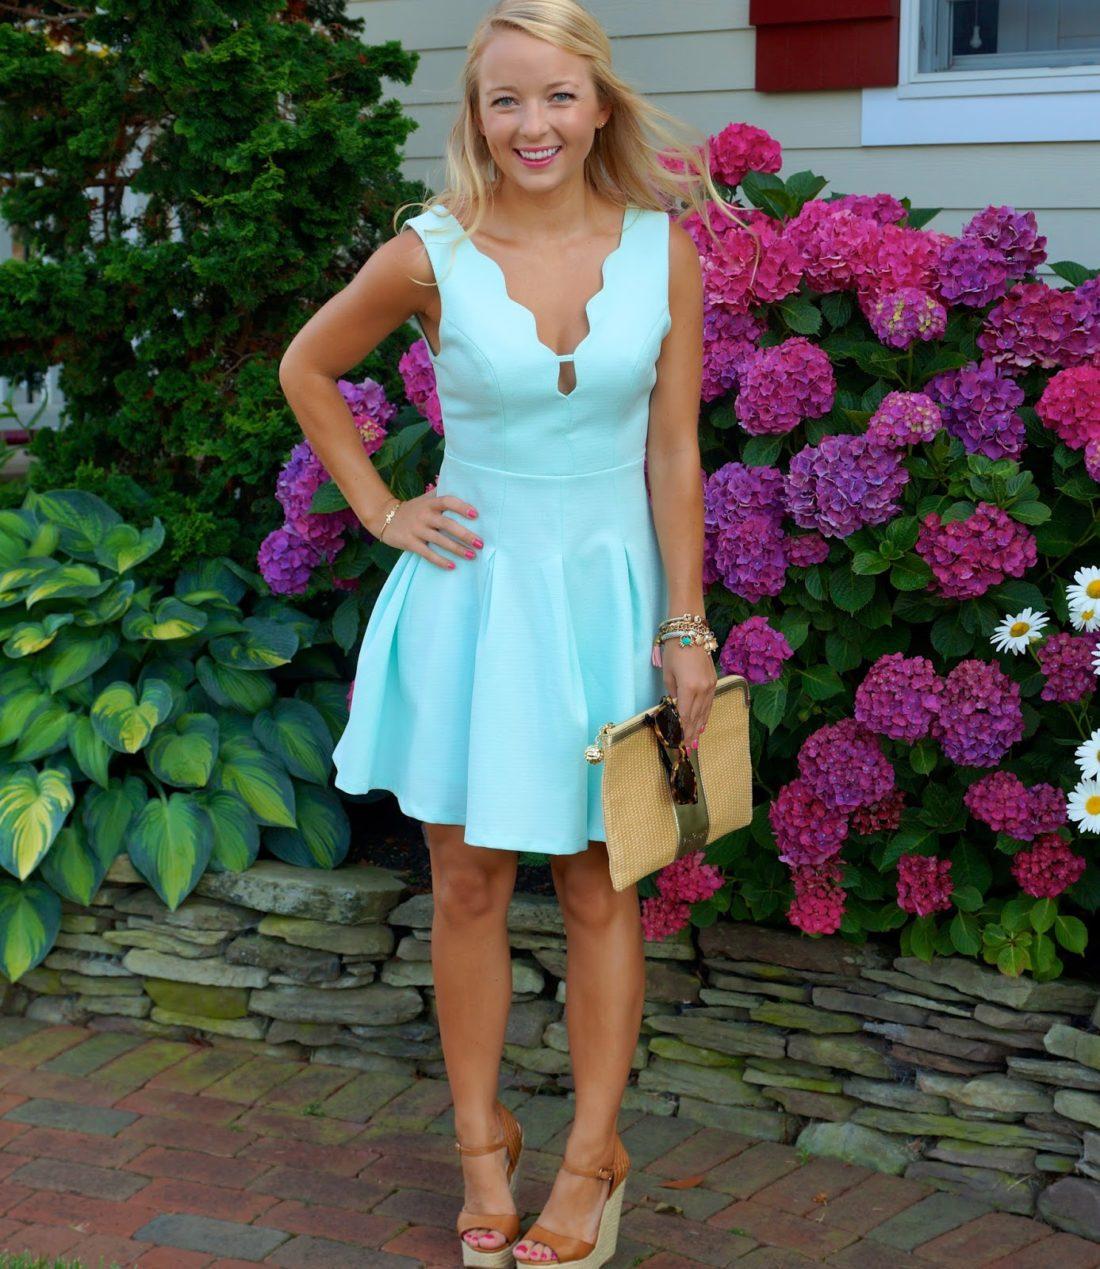 Little Scalloped Dress - I Believe in Pink